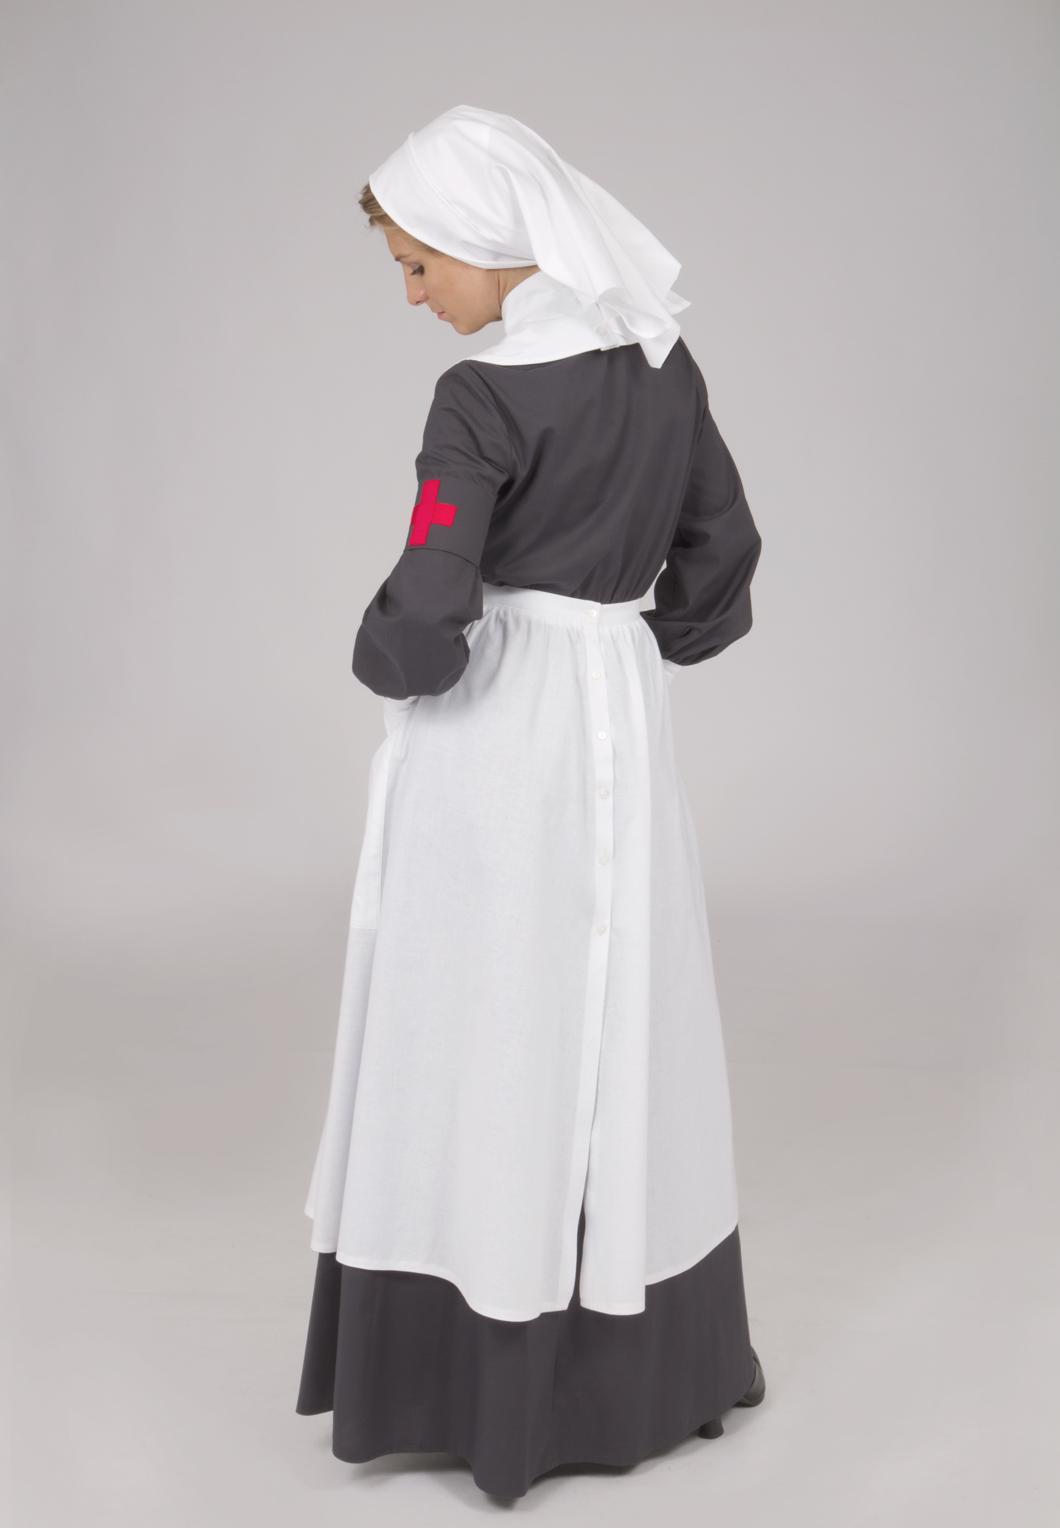 0b9a540ad39b4 World War I Nurse's Uniform   Recollections